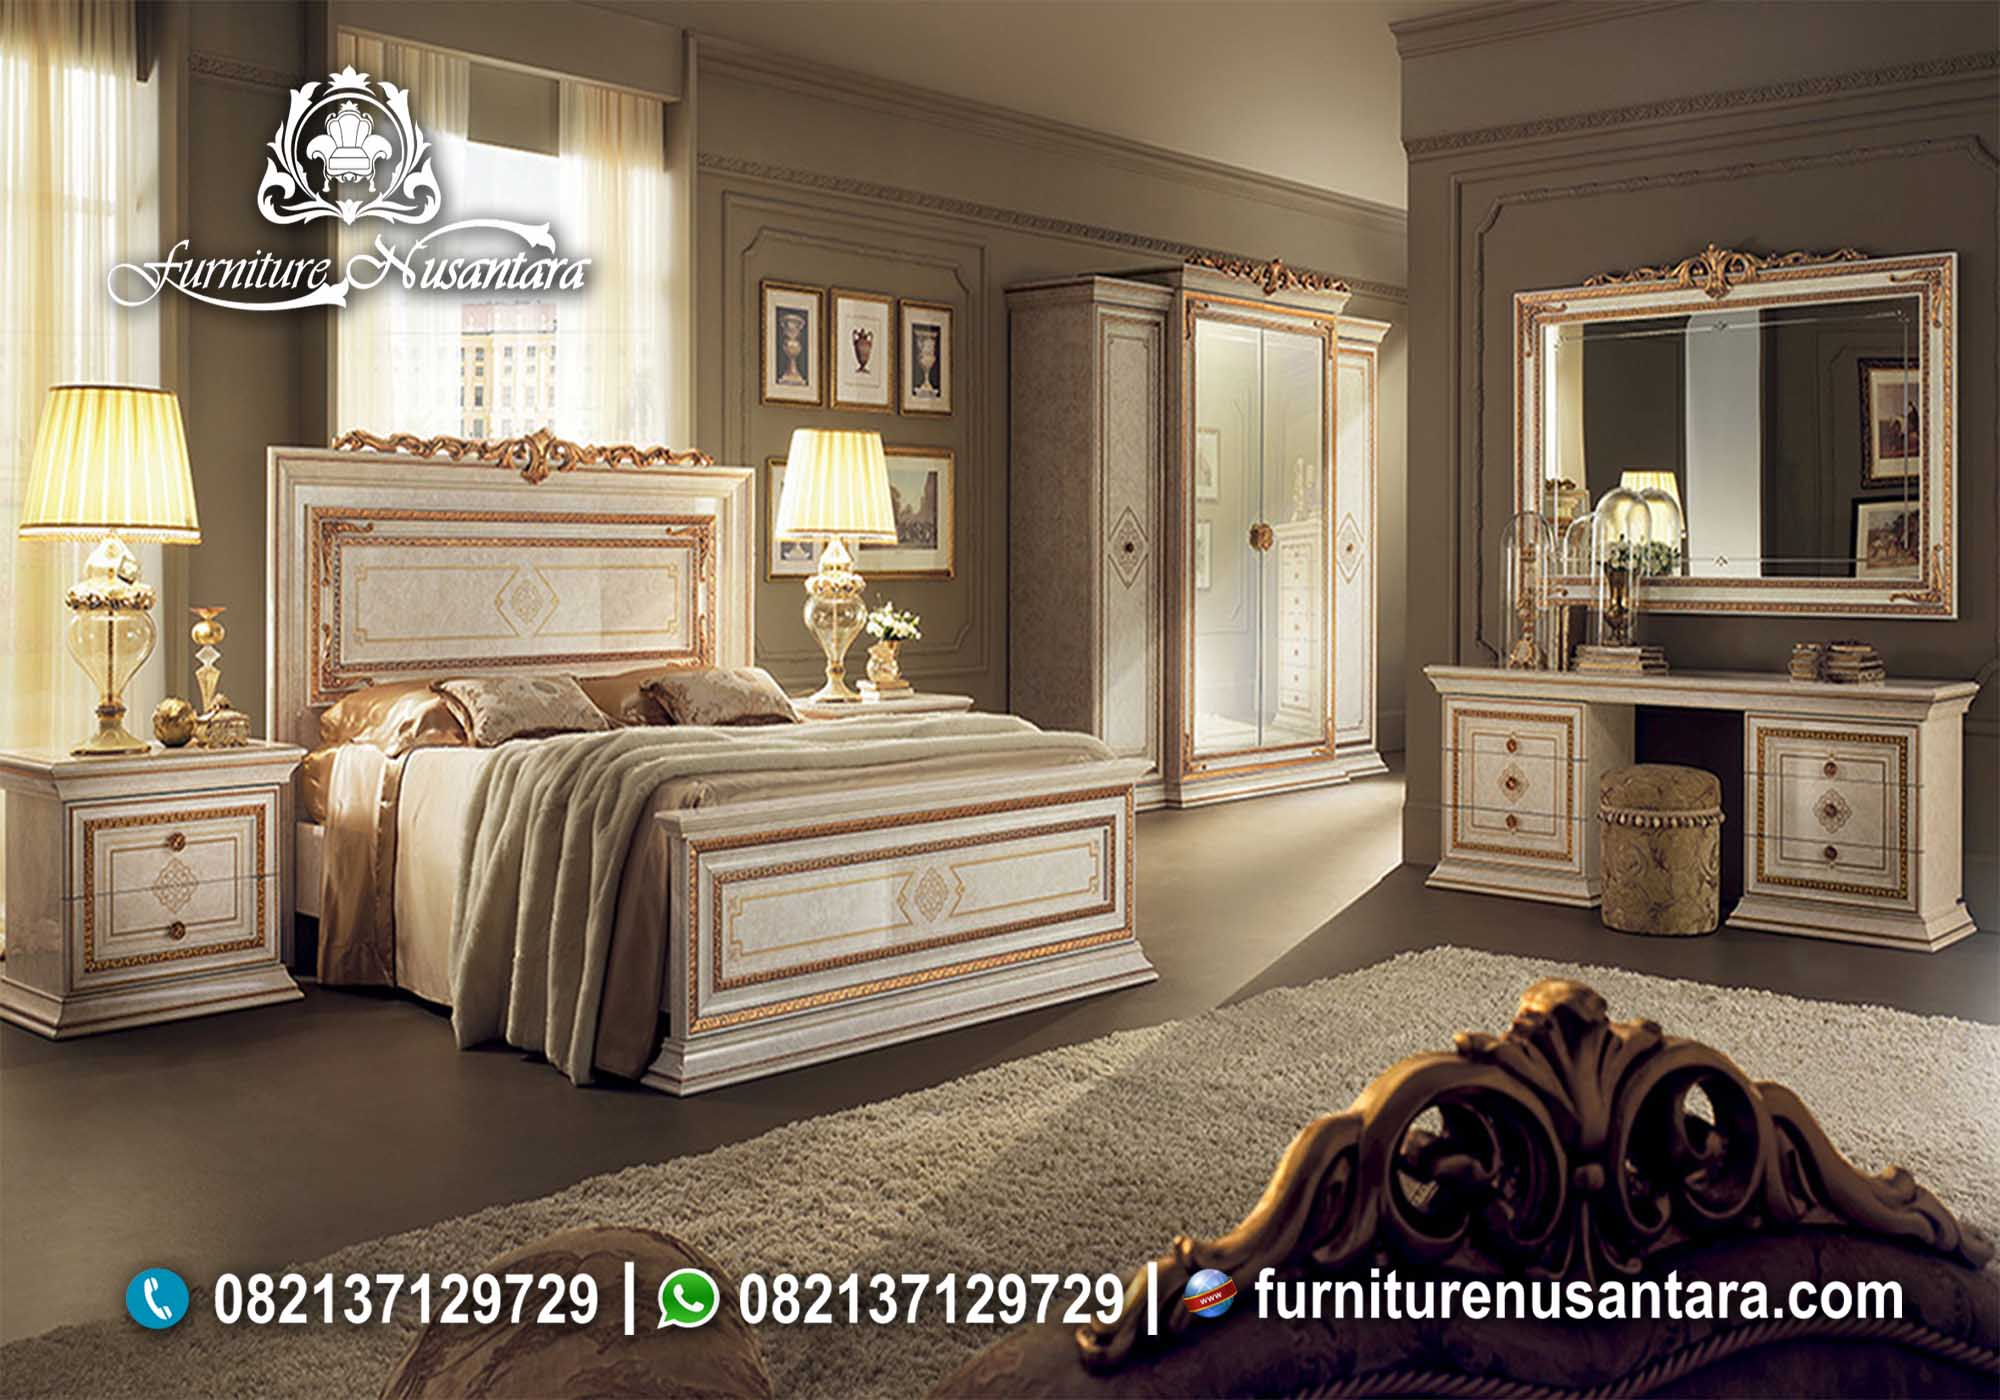 Model Kamar Minimalis Eropa KS-87, Furniture Nusantara